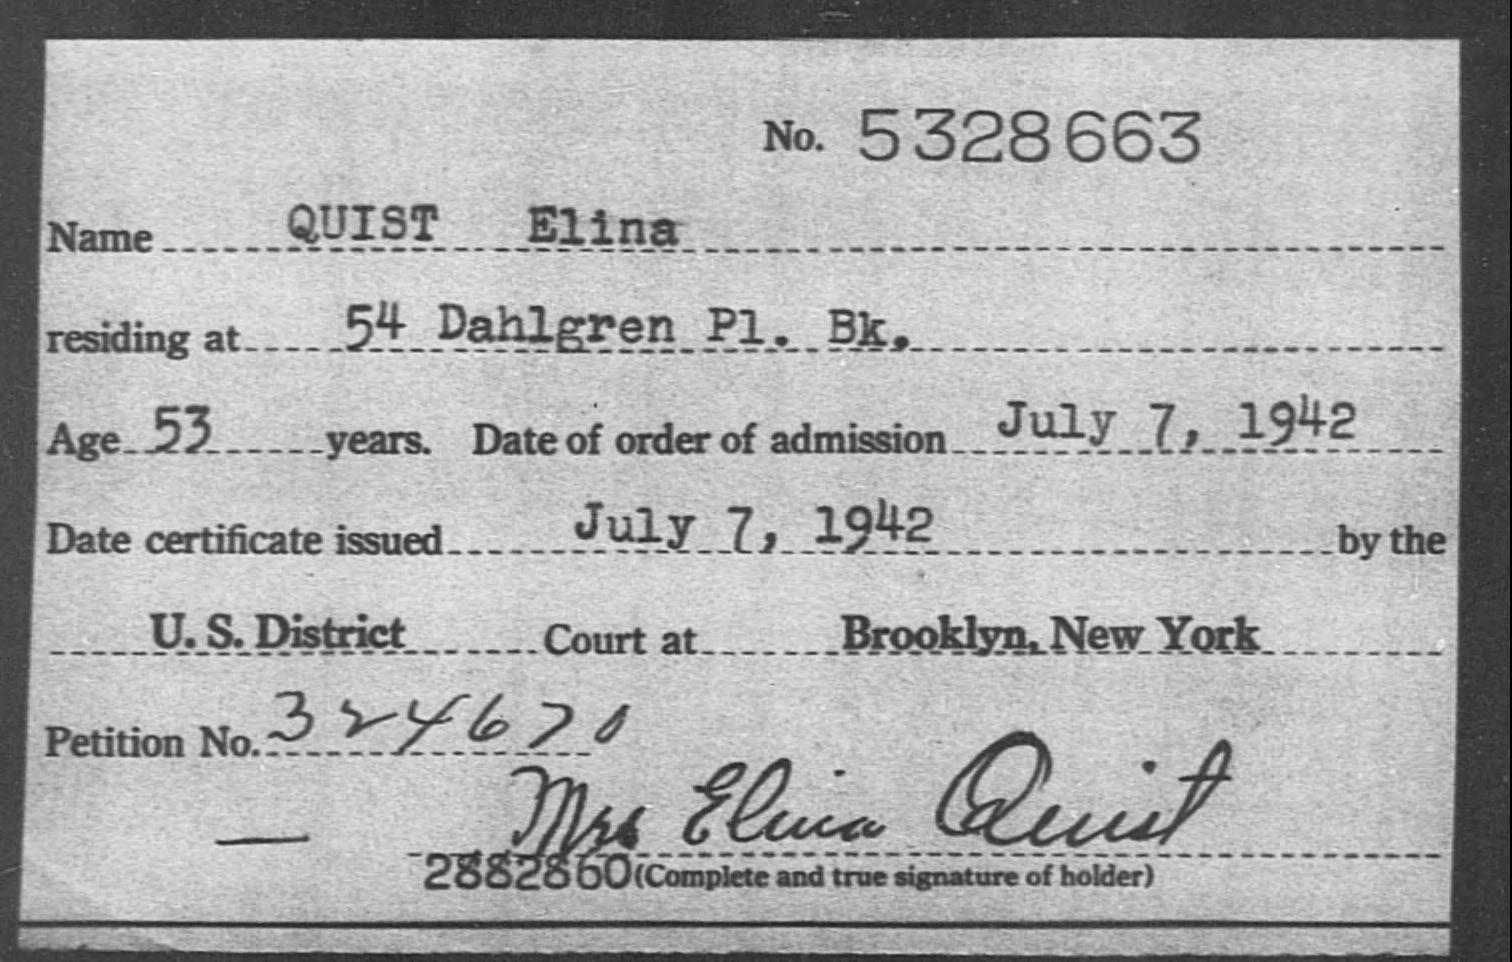 QUIST Elina - Born: [BLANK], Naturalized: 1942